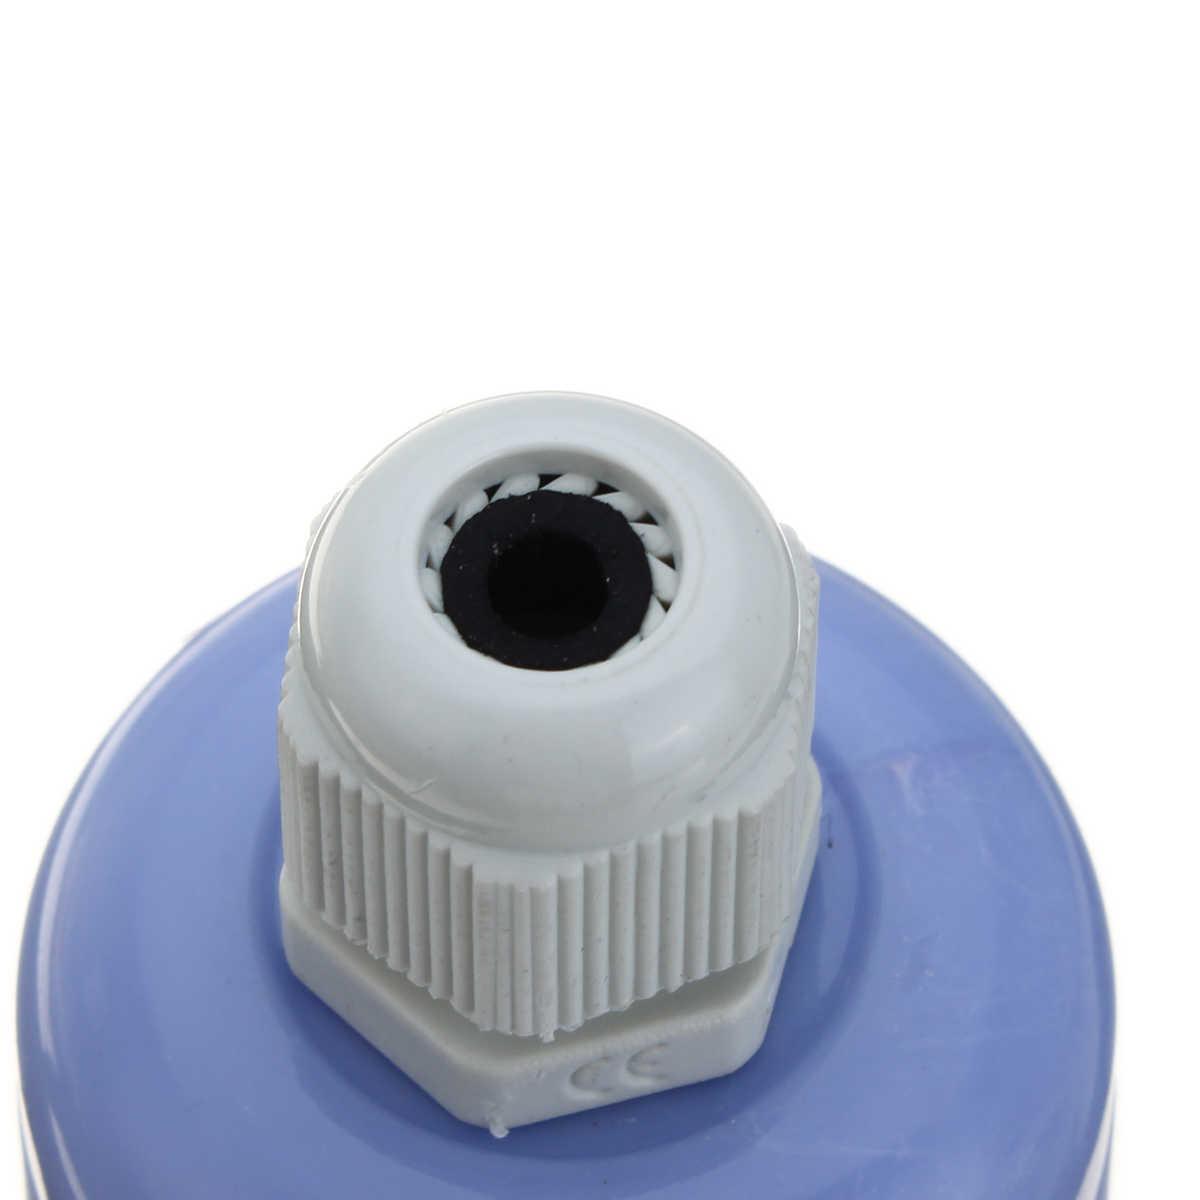 Smuxi E27 Base LED Light Lamp Bulb Waterproof Fireproof Holder Adapter Converter Socket Change